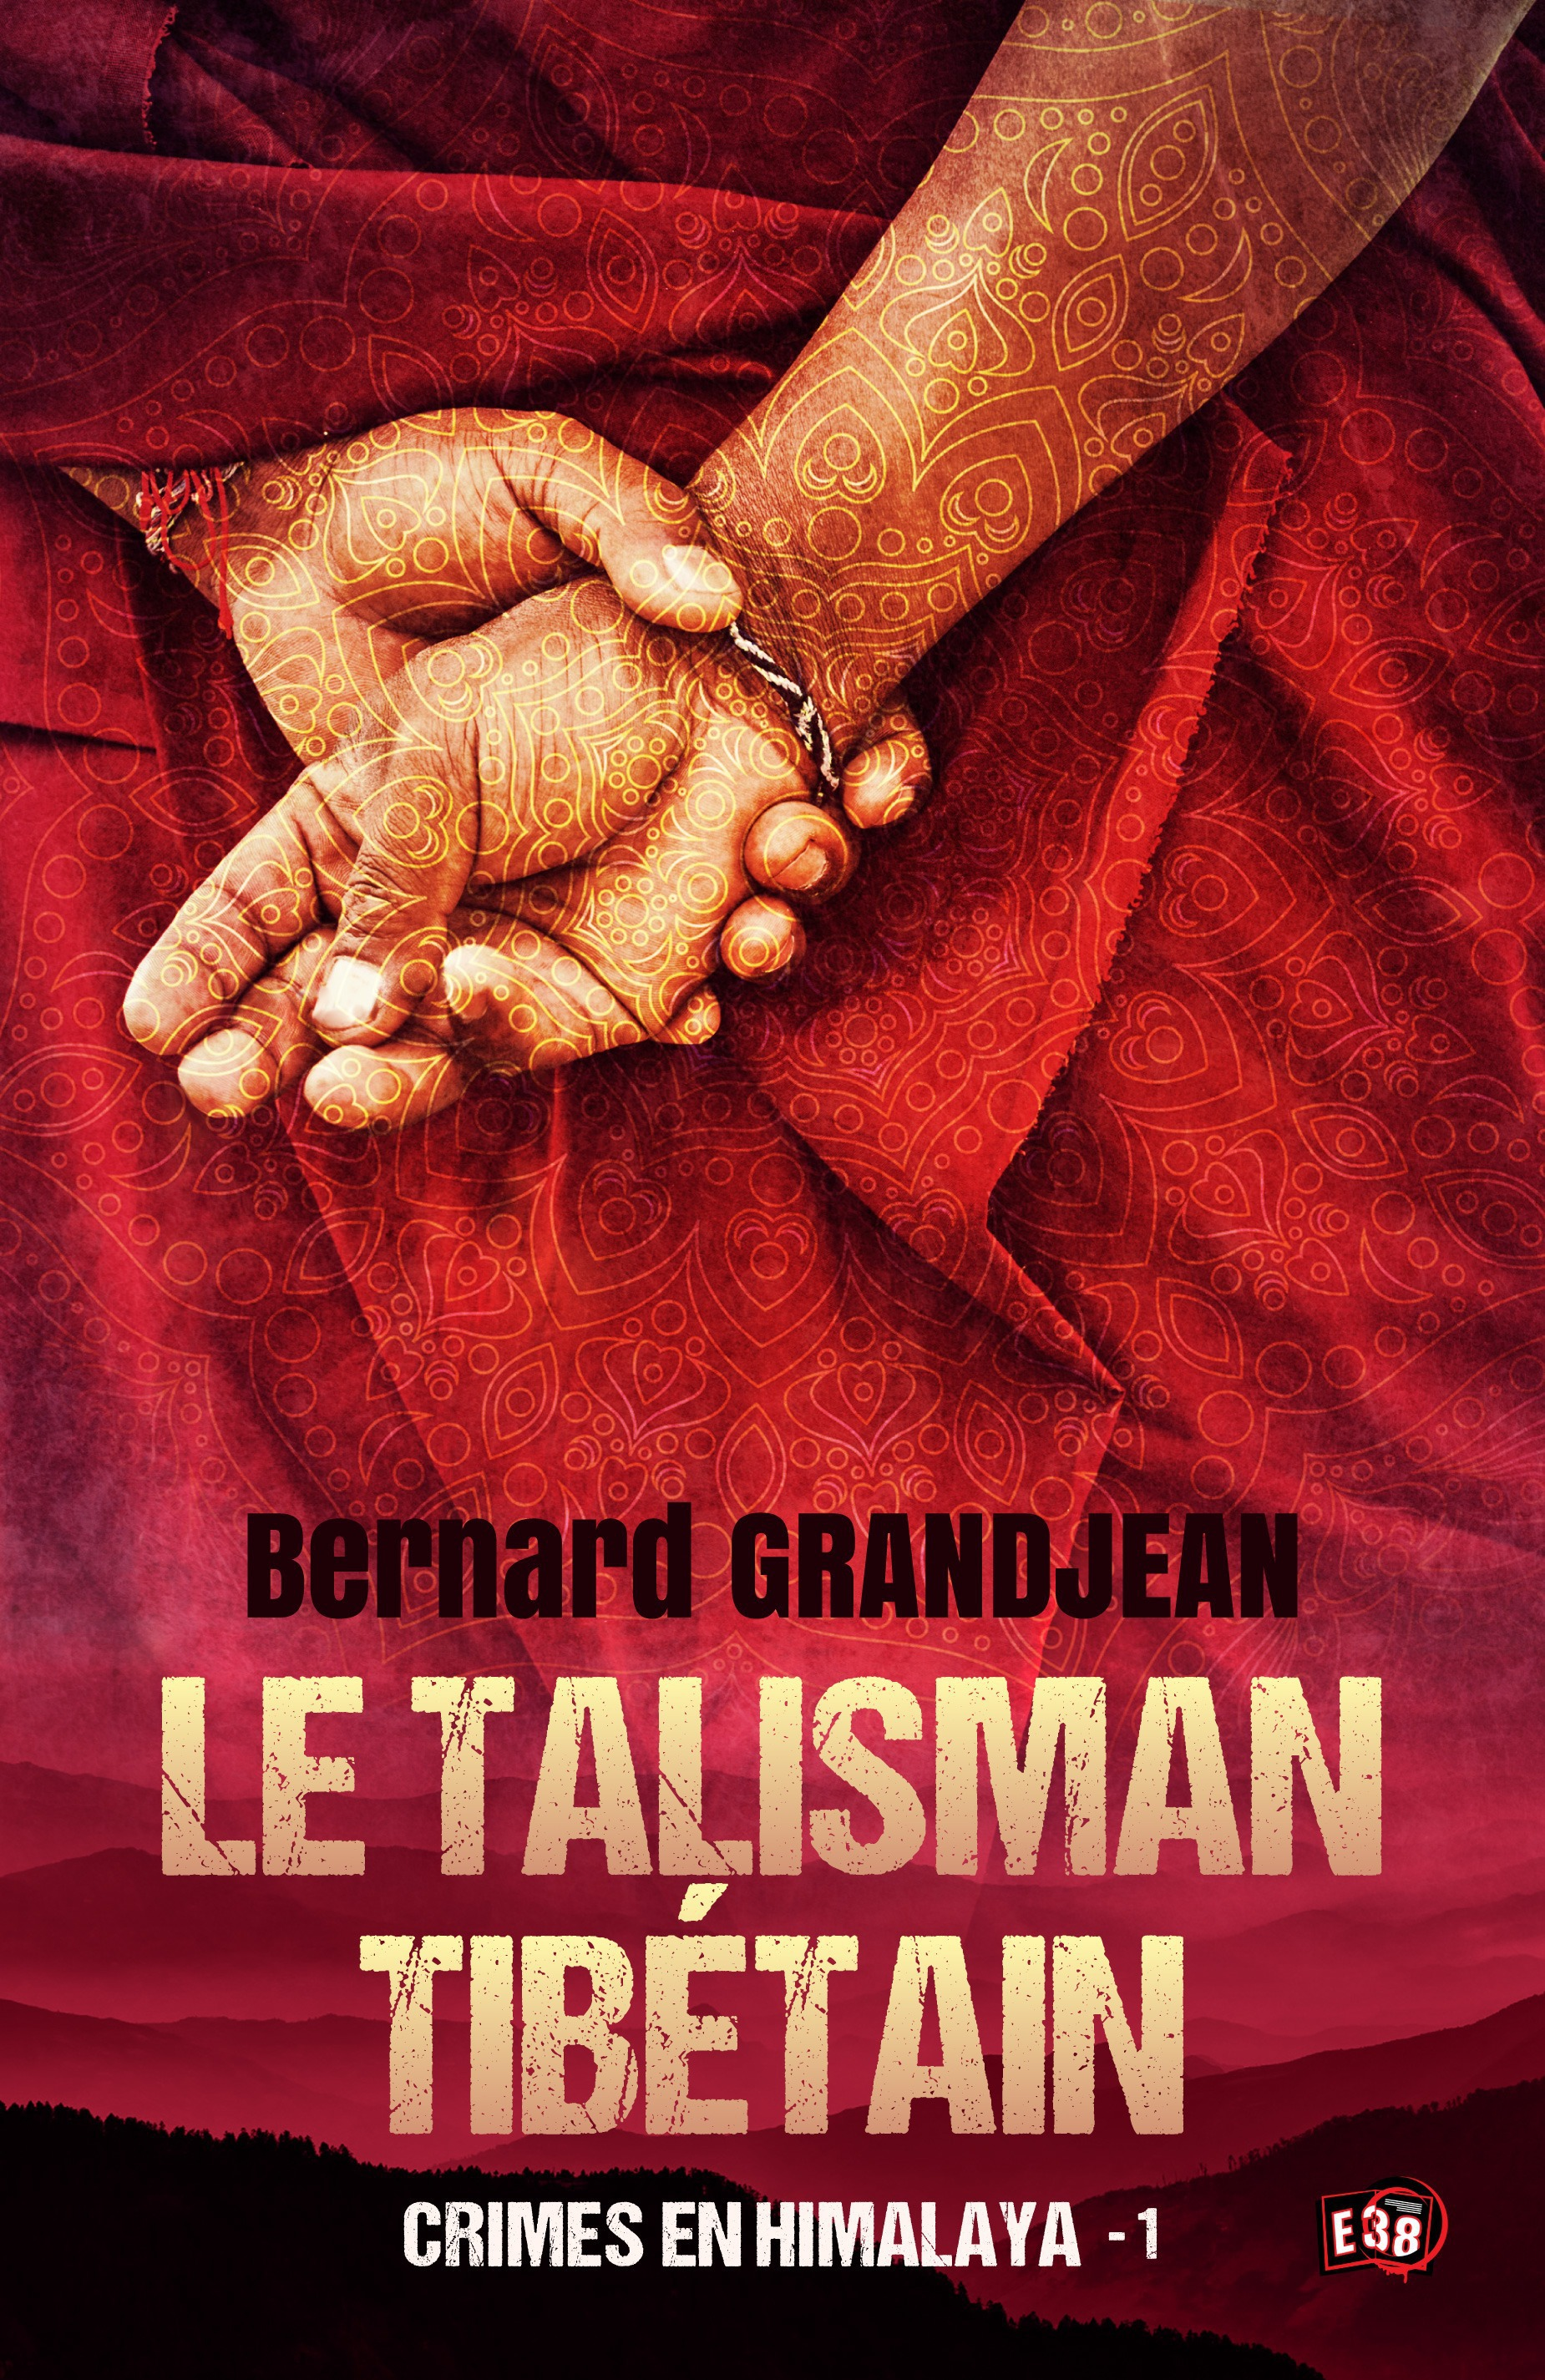 Le talisman tibetain - crimes en himalaya 1